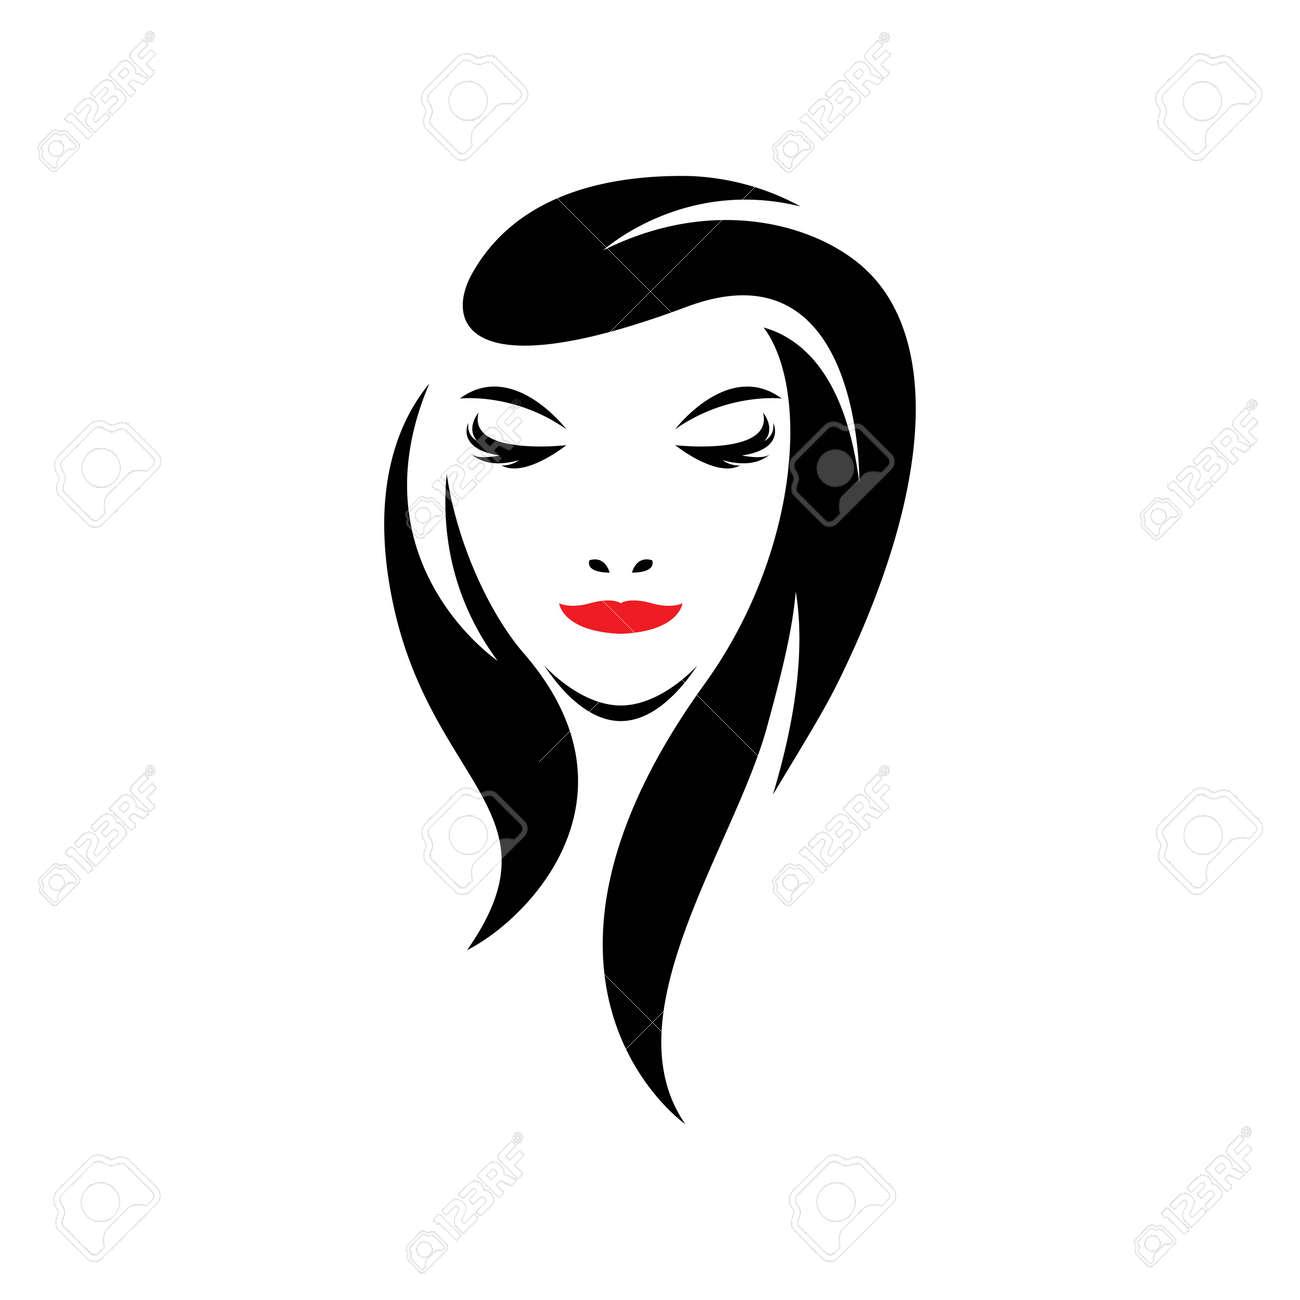 Beauty hair and salon logo images illustration design - 173289000